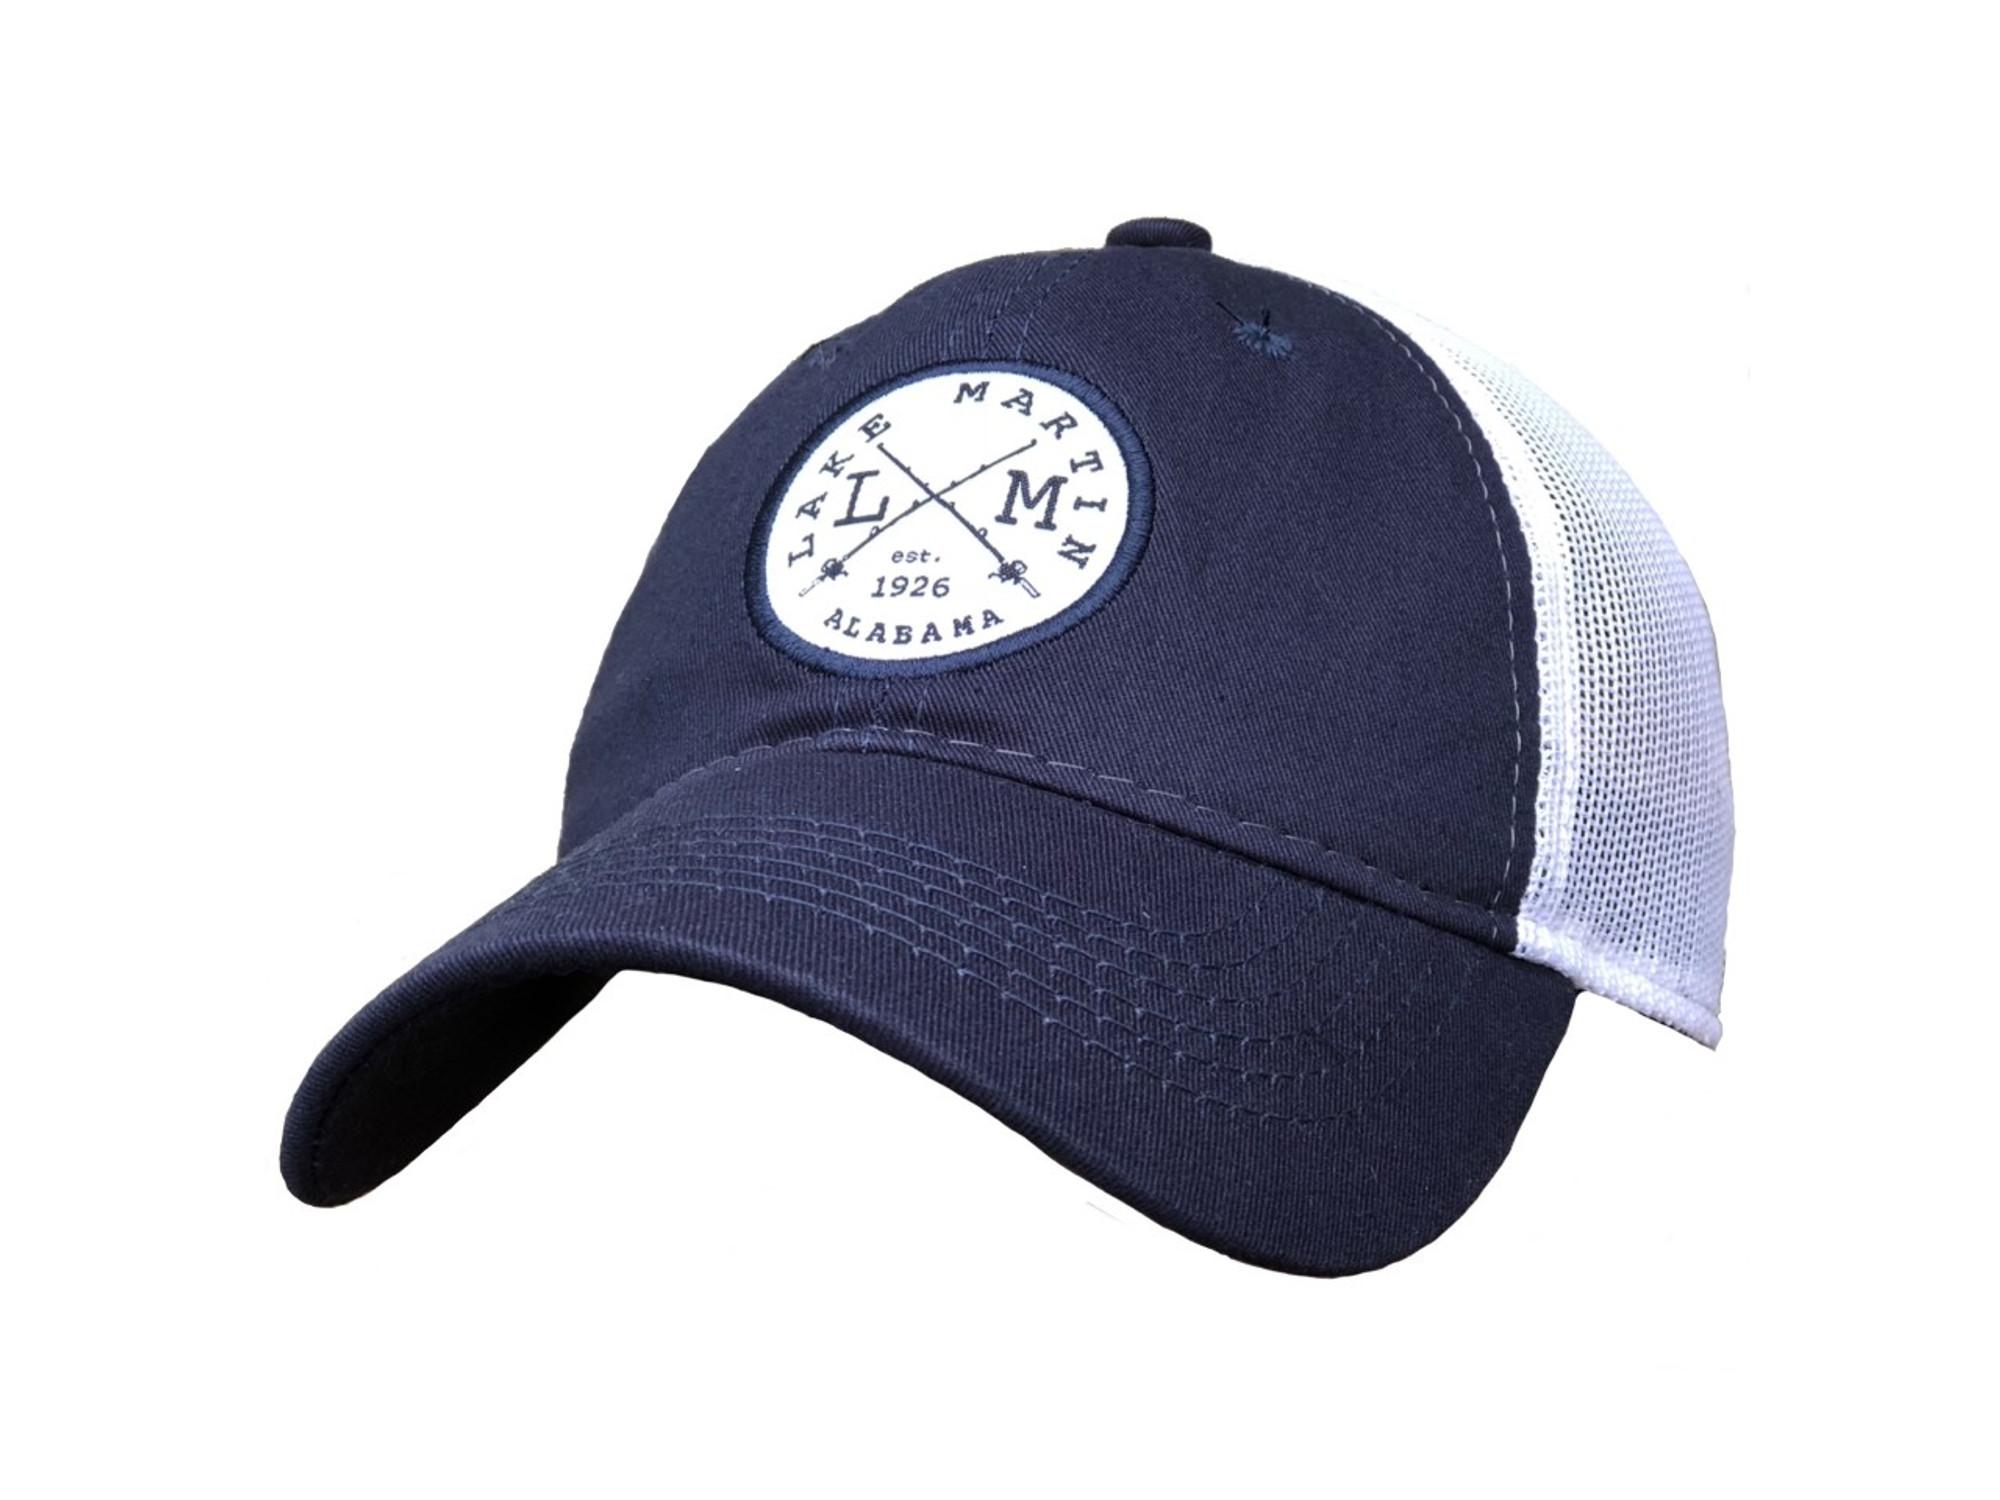 97408591a Lake Martin Navy Blue Mesh Trucker Hat - Mikes Merchandise